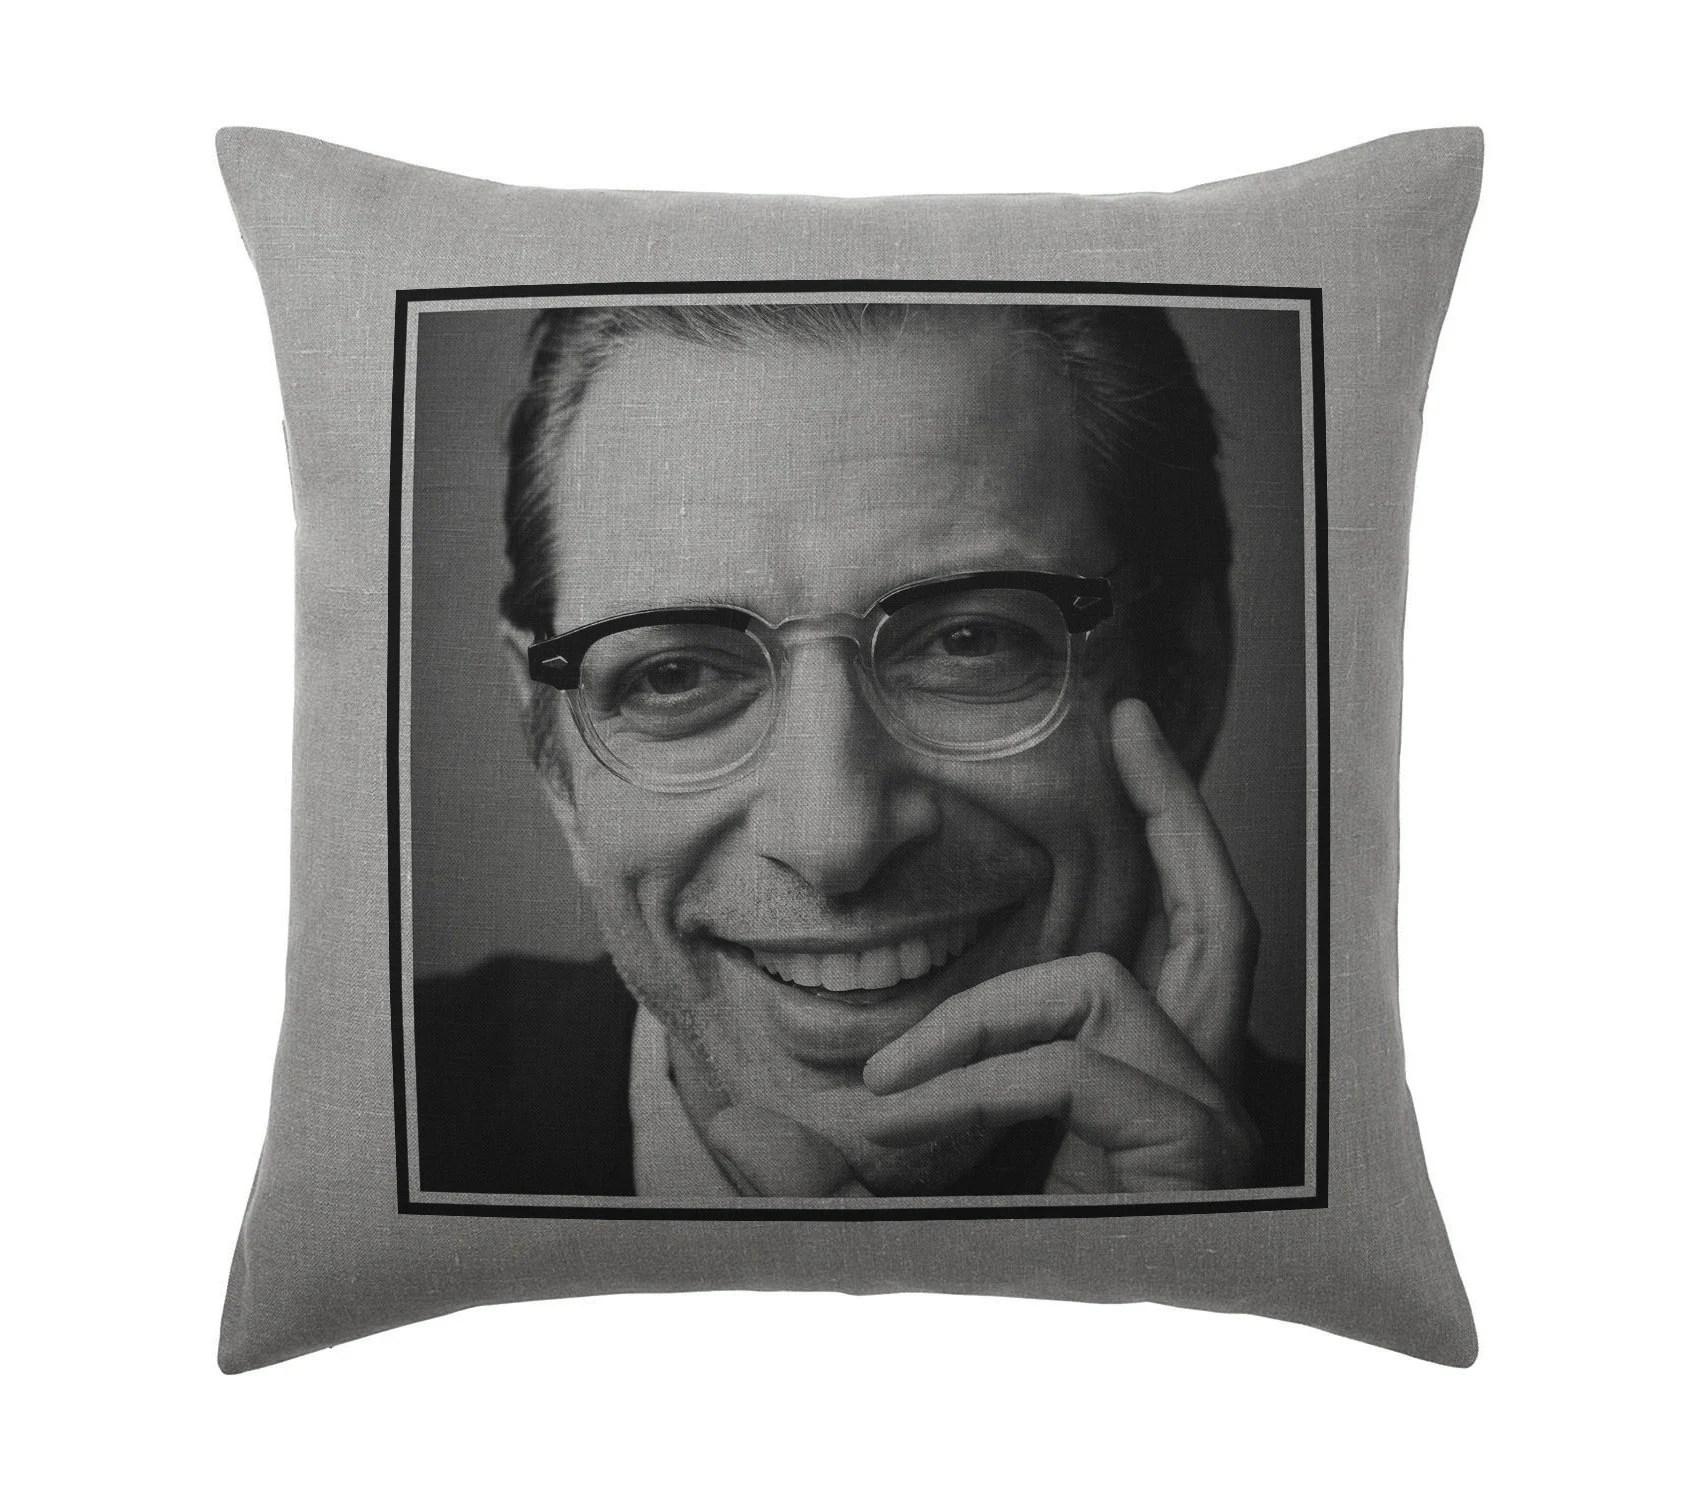 jeff goldblum pillow etsy